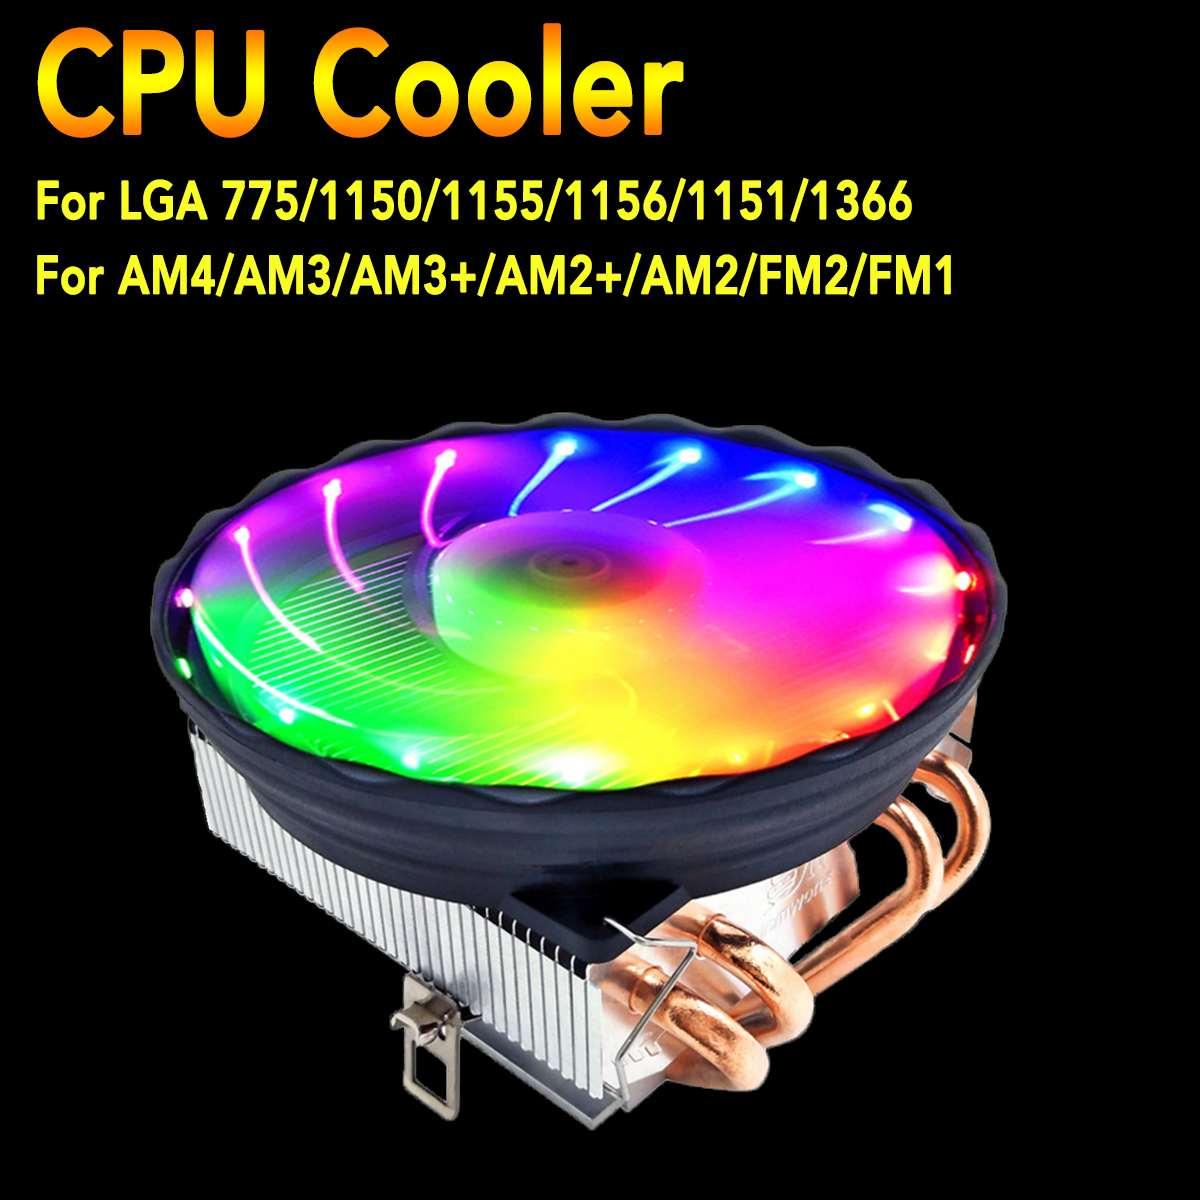 Ventilador LED RGB de 120mm, 4 Heatpipe CPU Cooler para Intel LGA 1150/1151/1155/1156/1366/775, radiador de refrigeración para AMD AM3 + AM3 AM2 + AM2